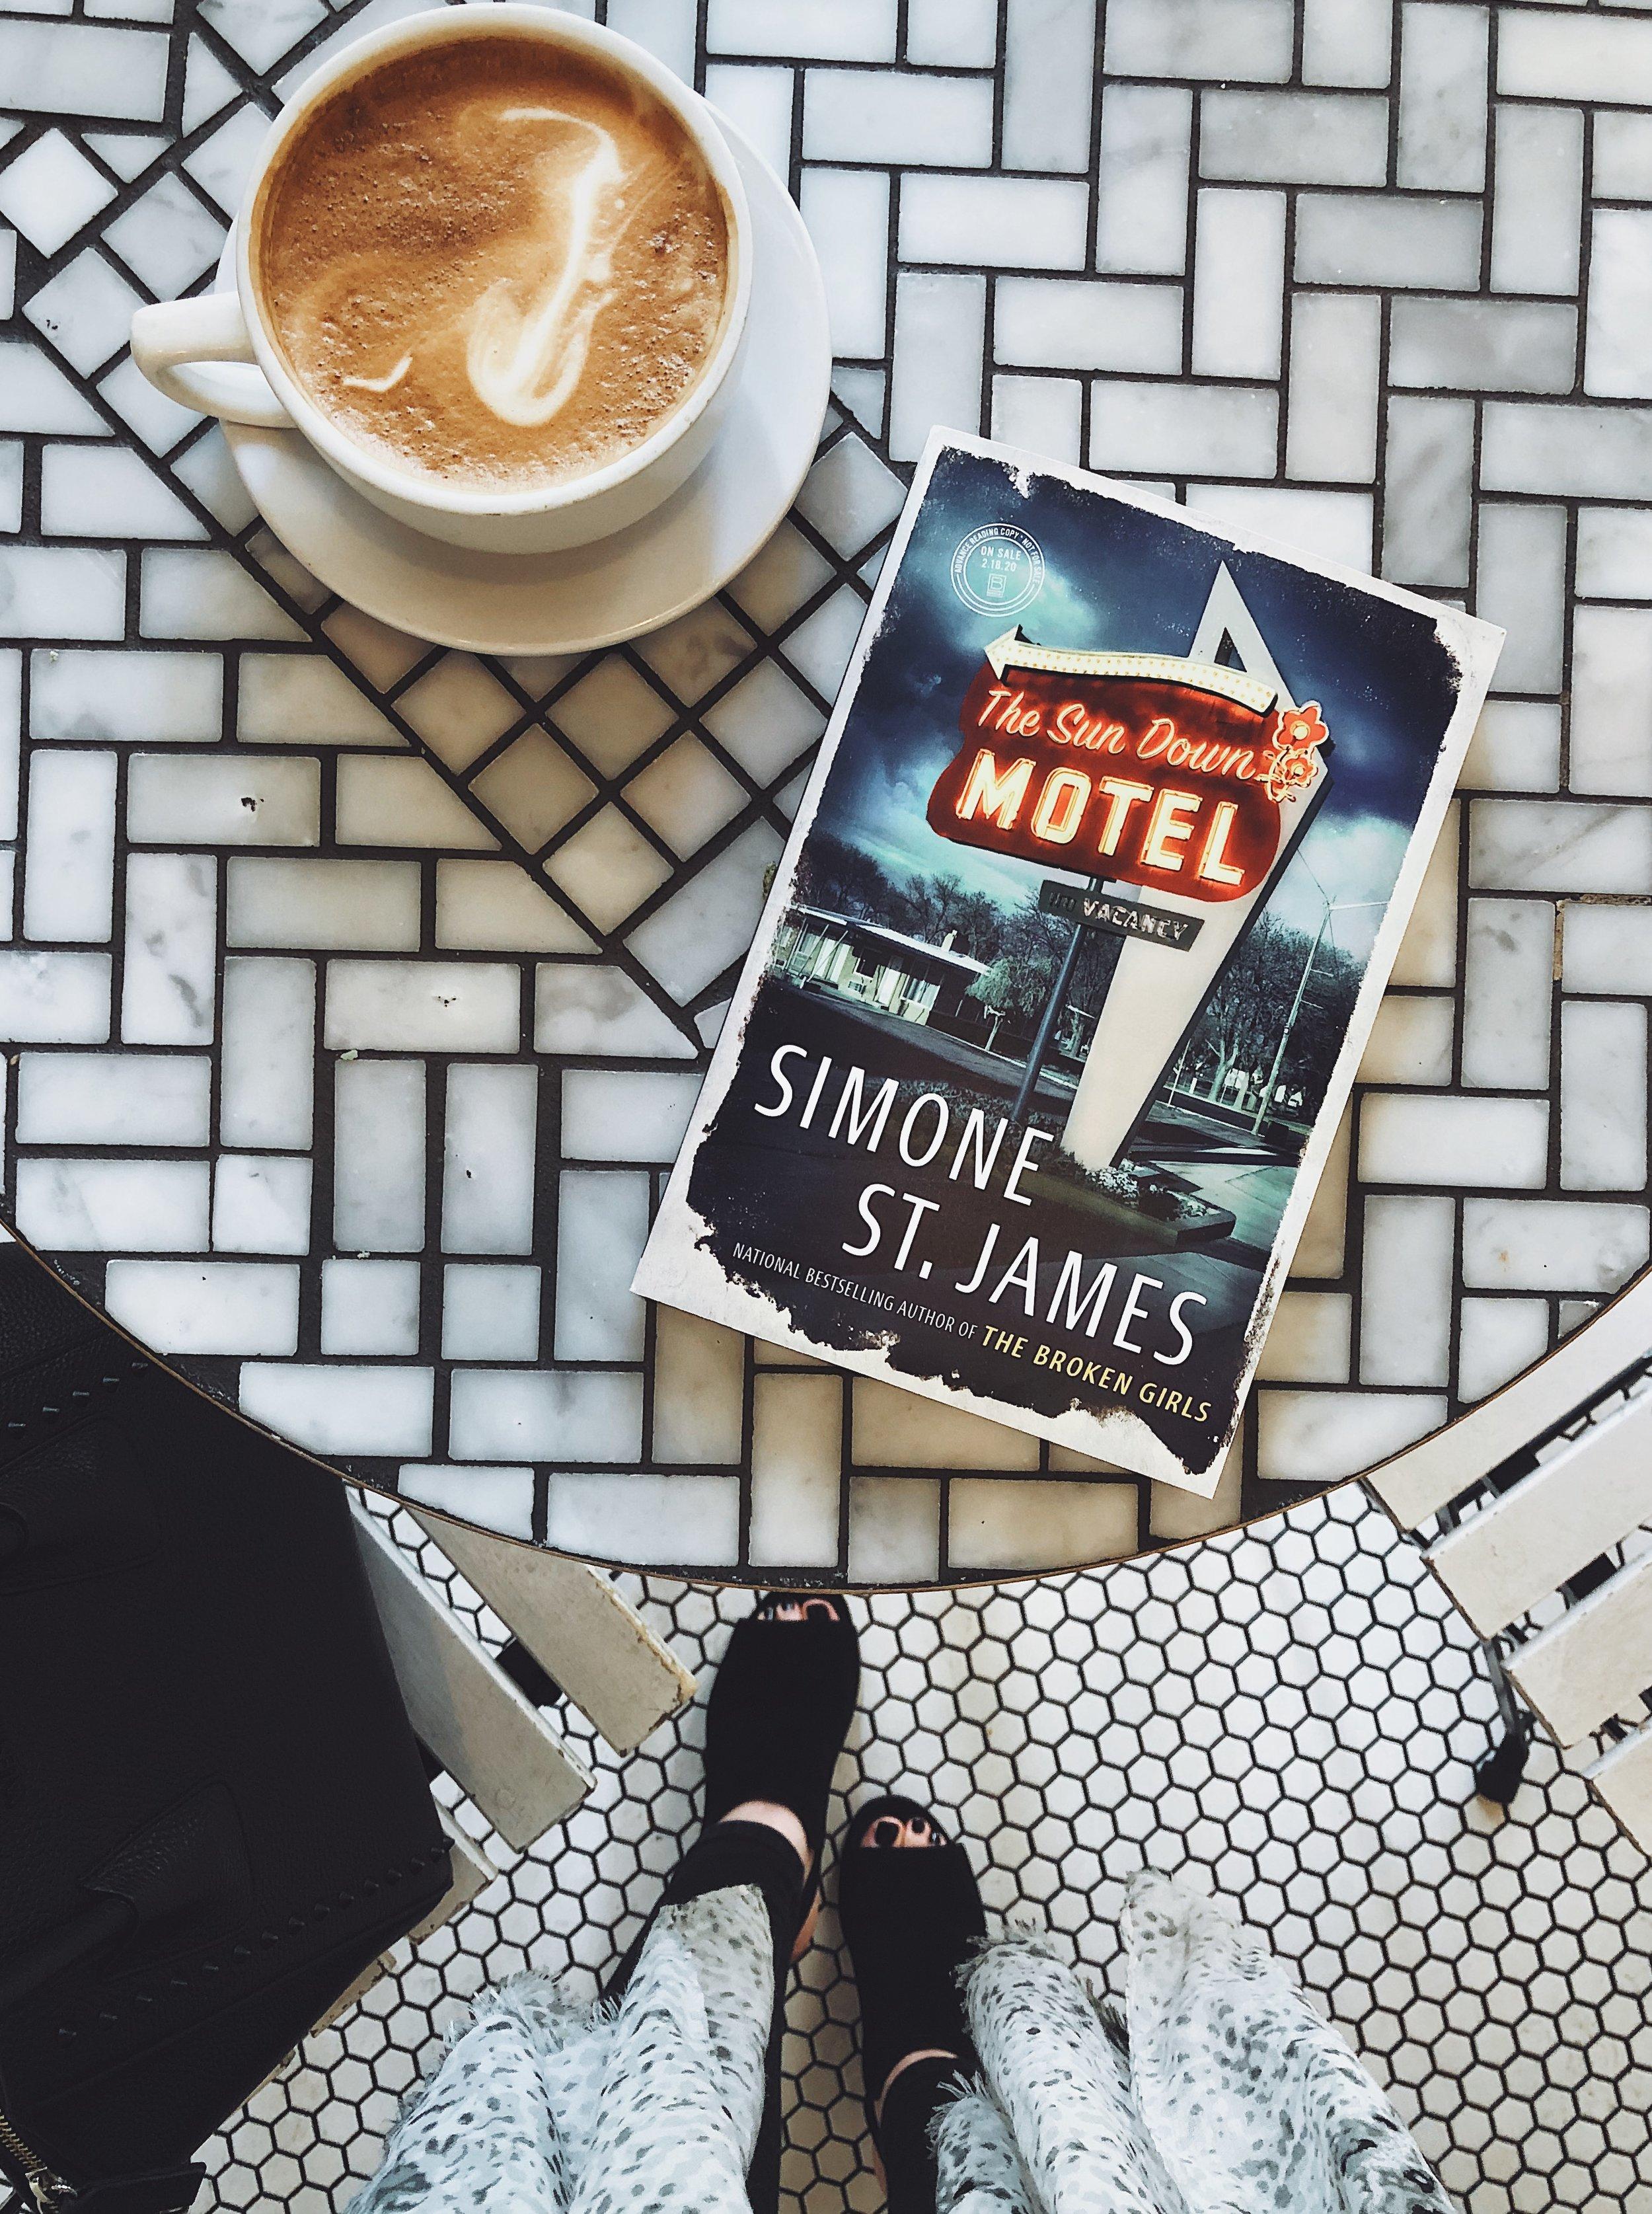 The Sun Down Motel Simone St. James.JPG